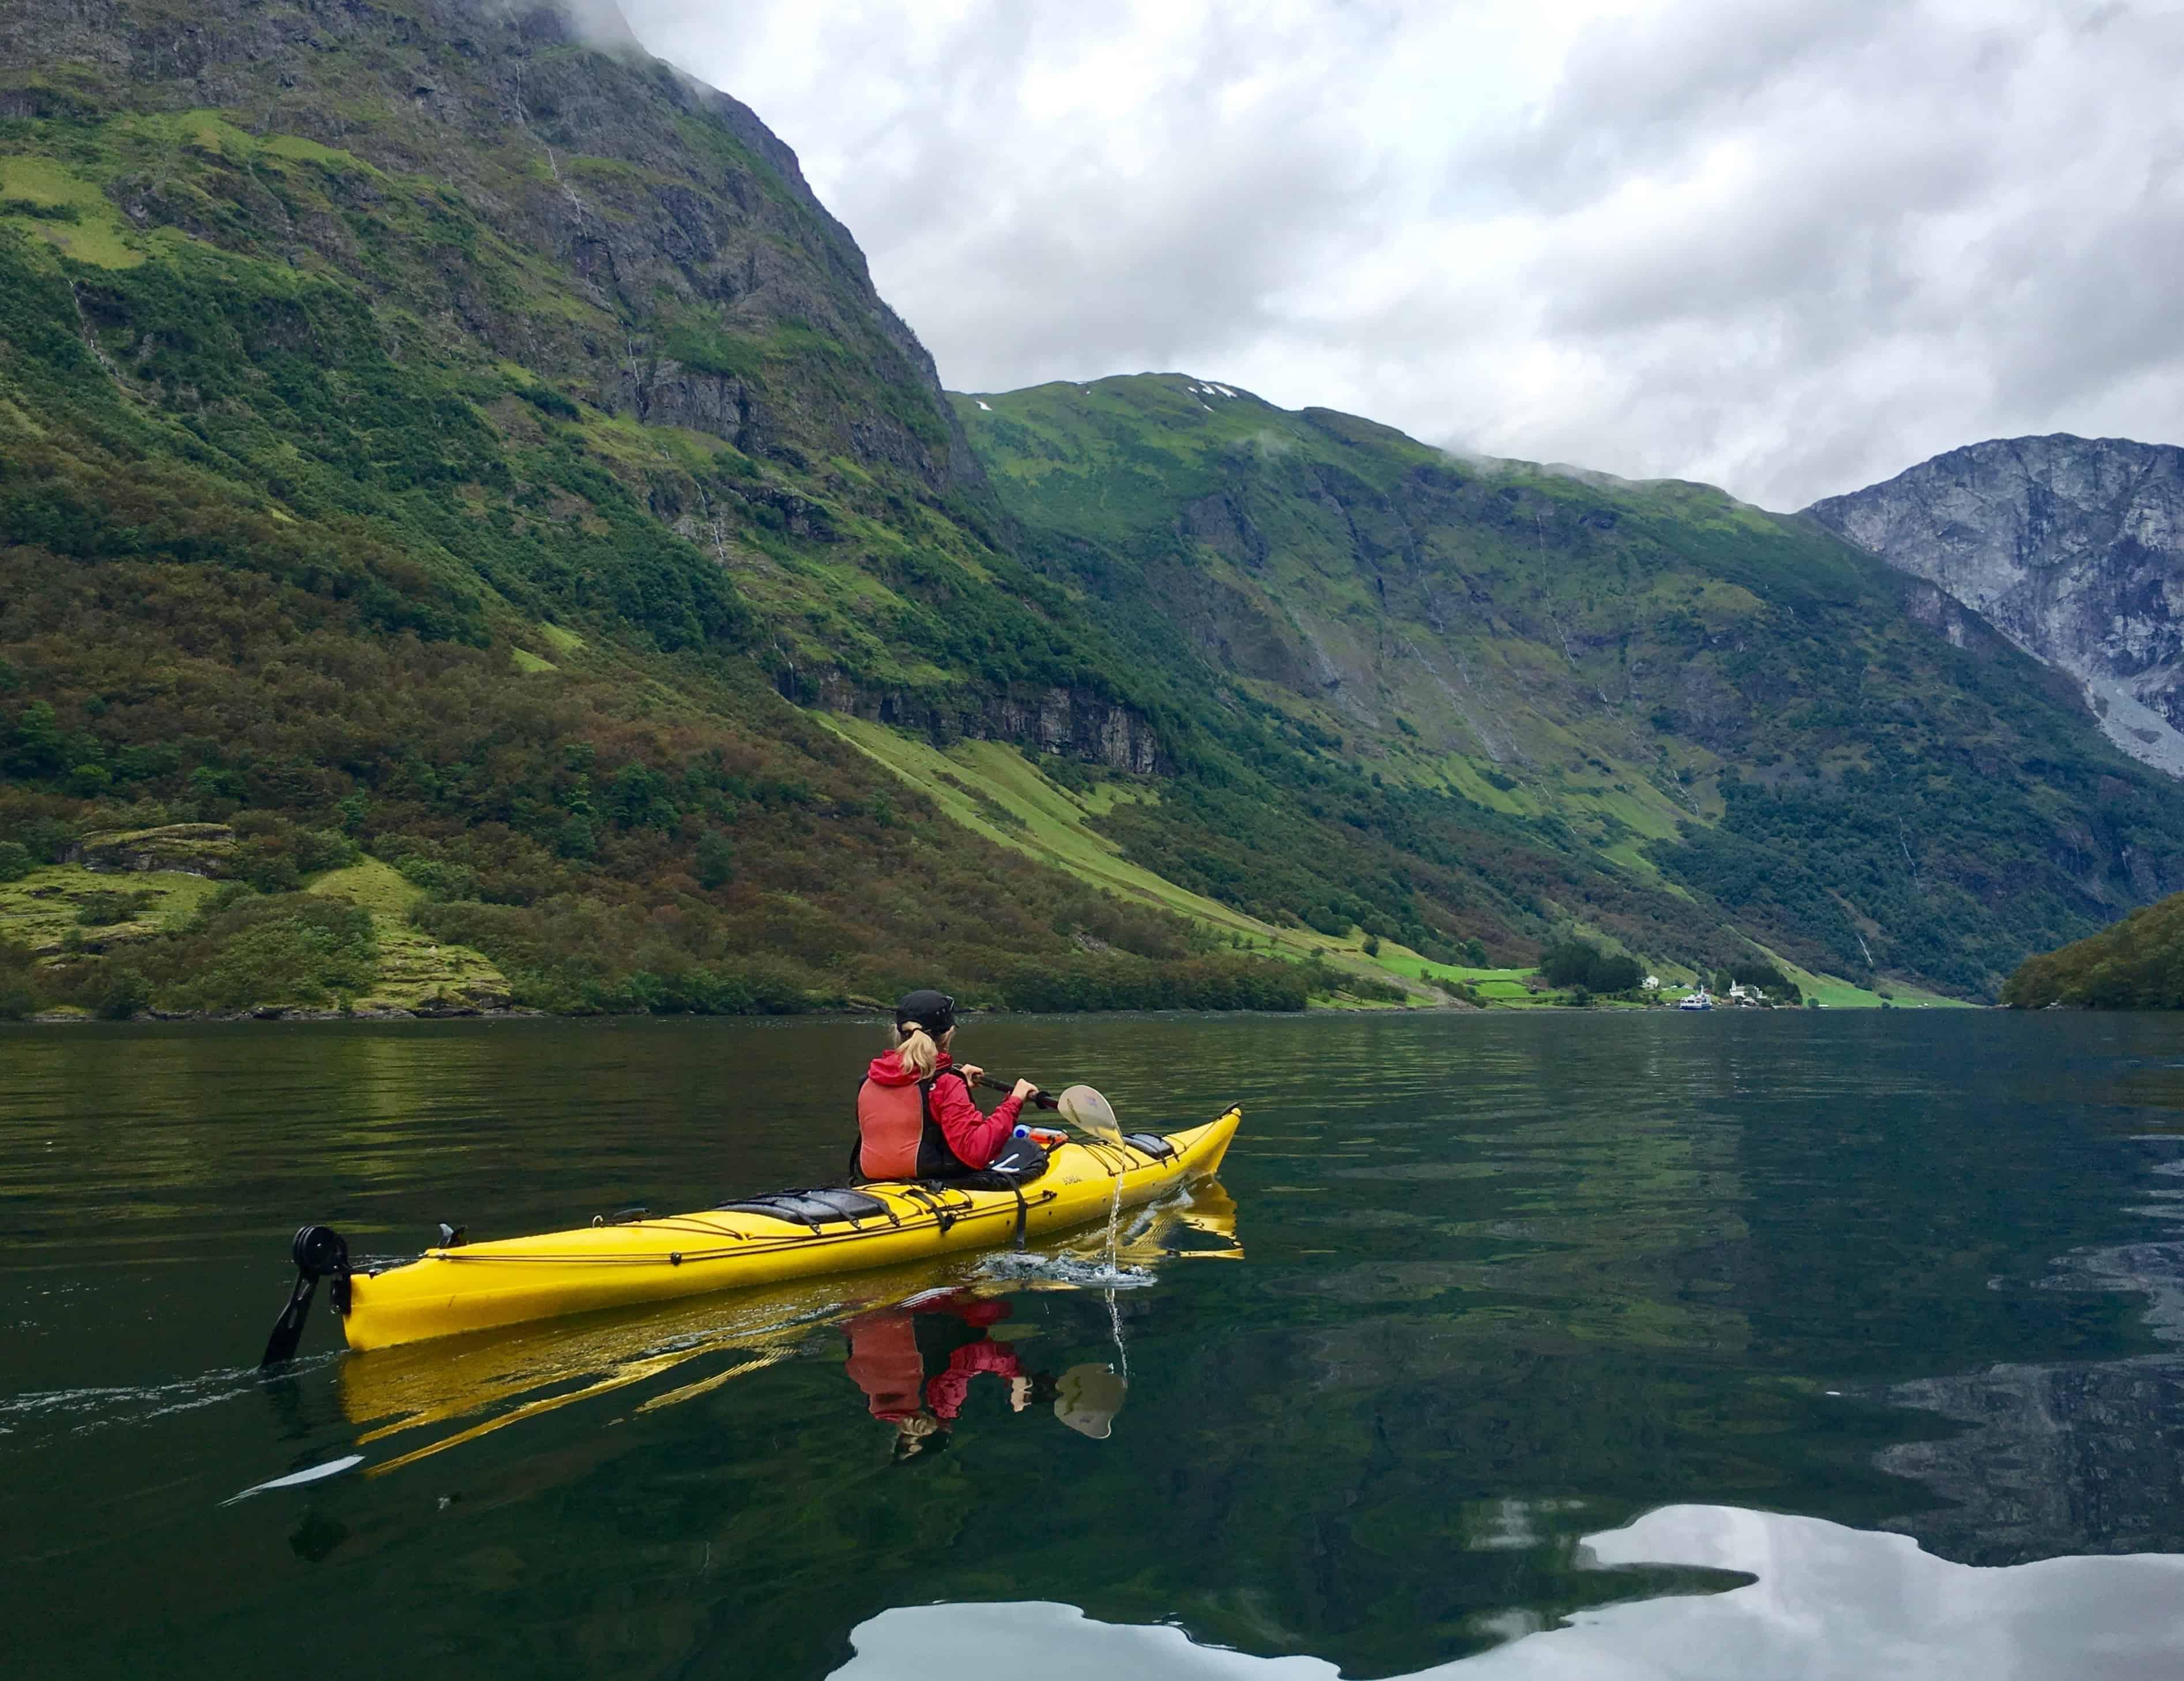 Dan in a quiet moment on Naeroyfjord